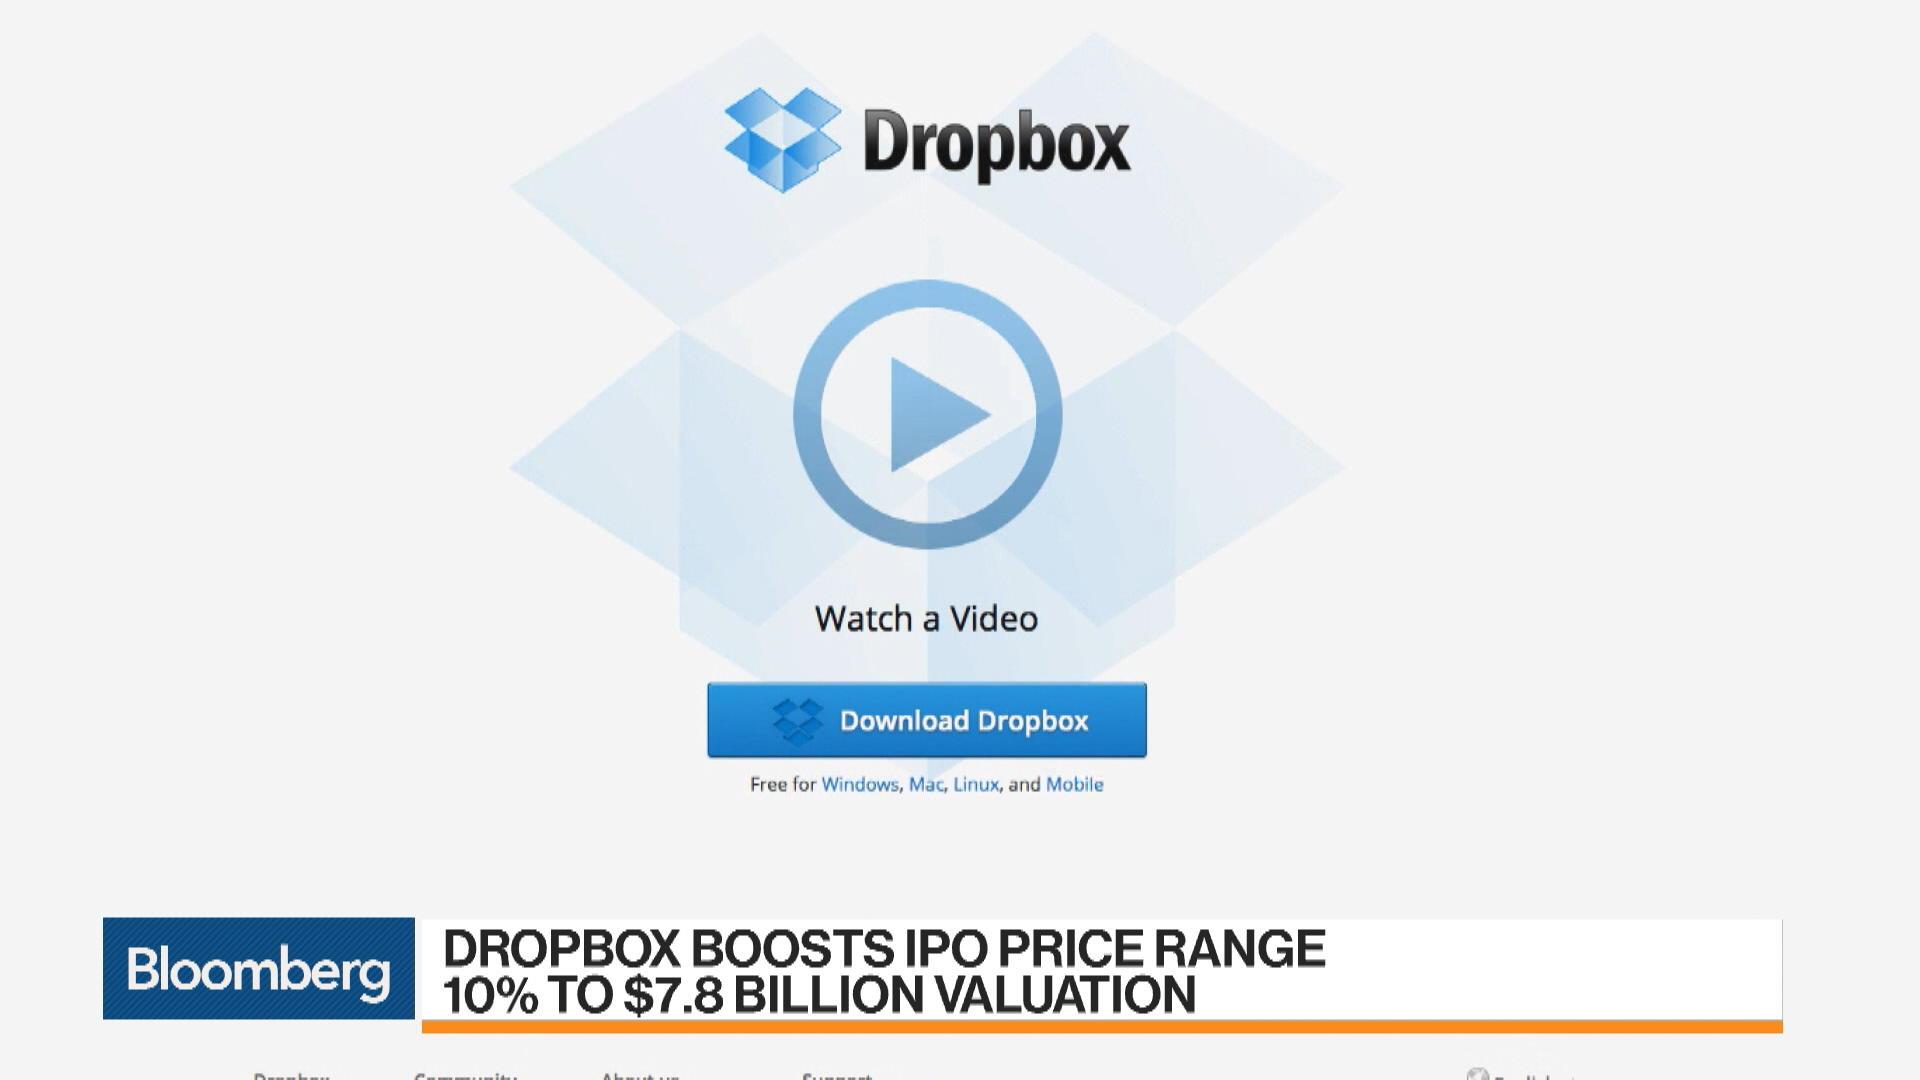 Dbxnasdaq Gs Stock Quote Dropbox Inc Bloomberg Markets